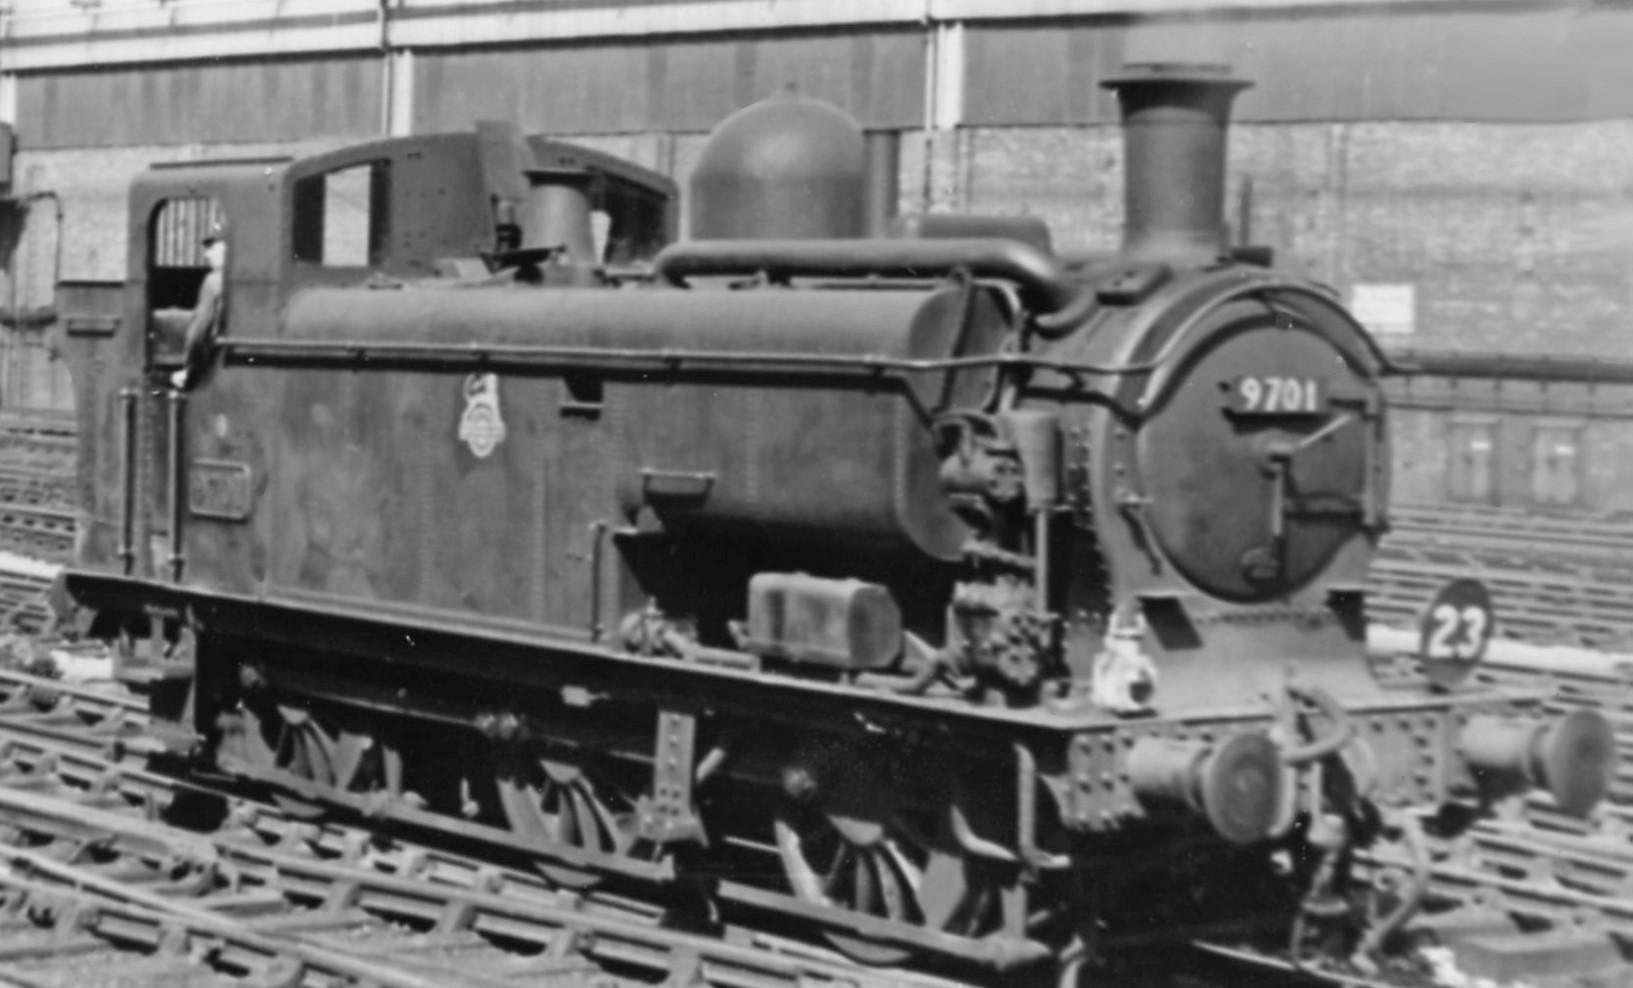 9701 at London Paddington in August 1956. ©Ben Brooksbank